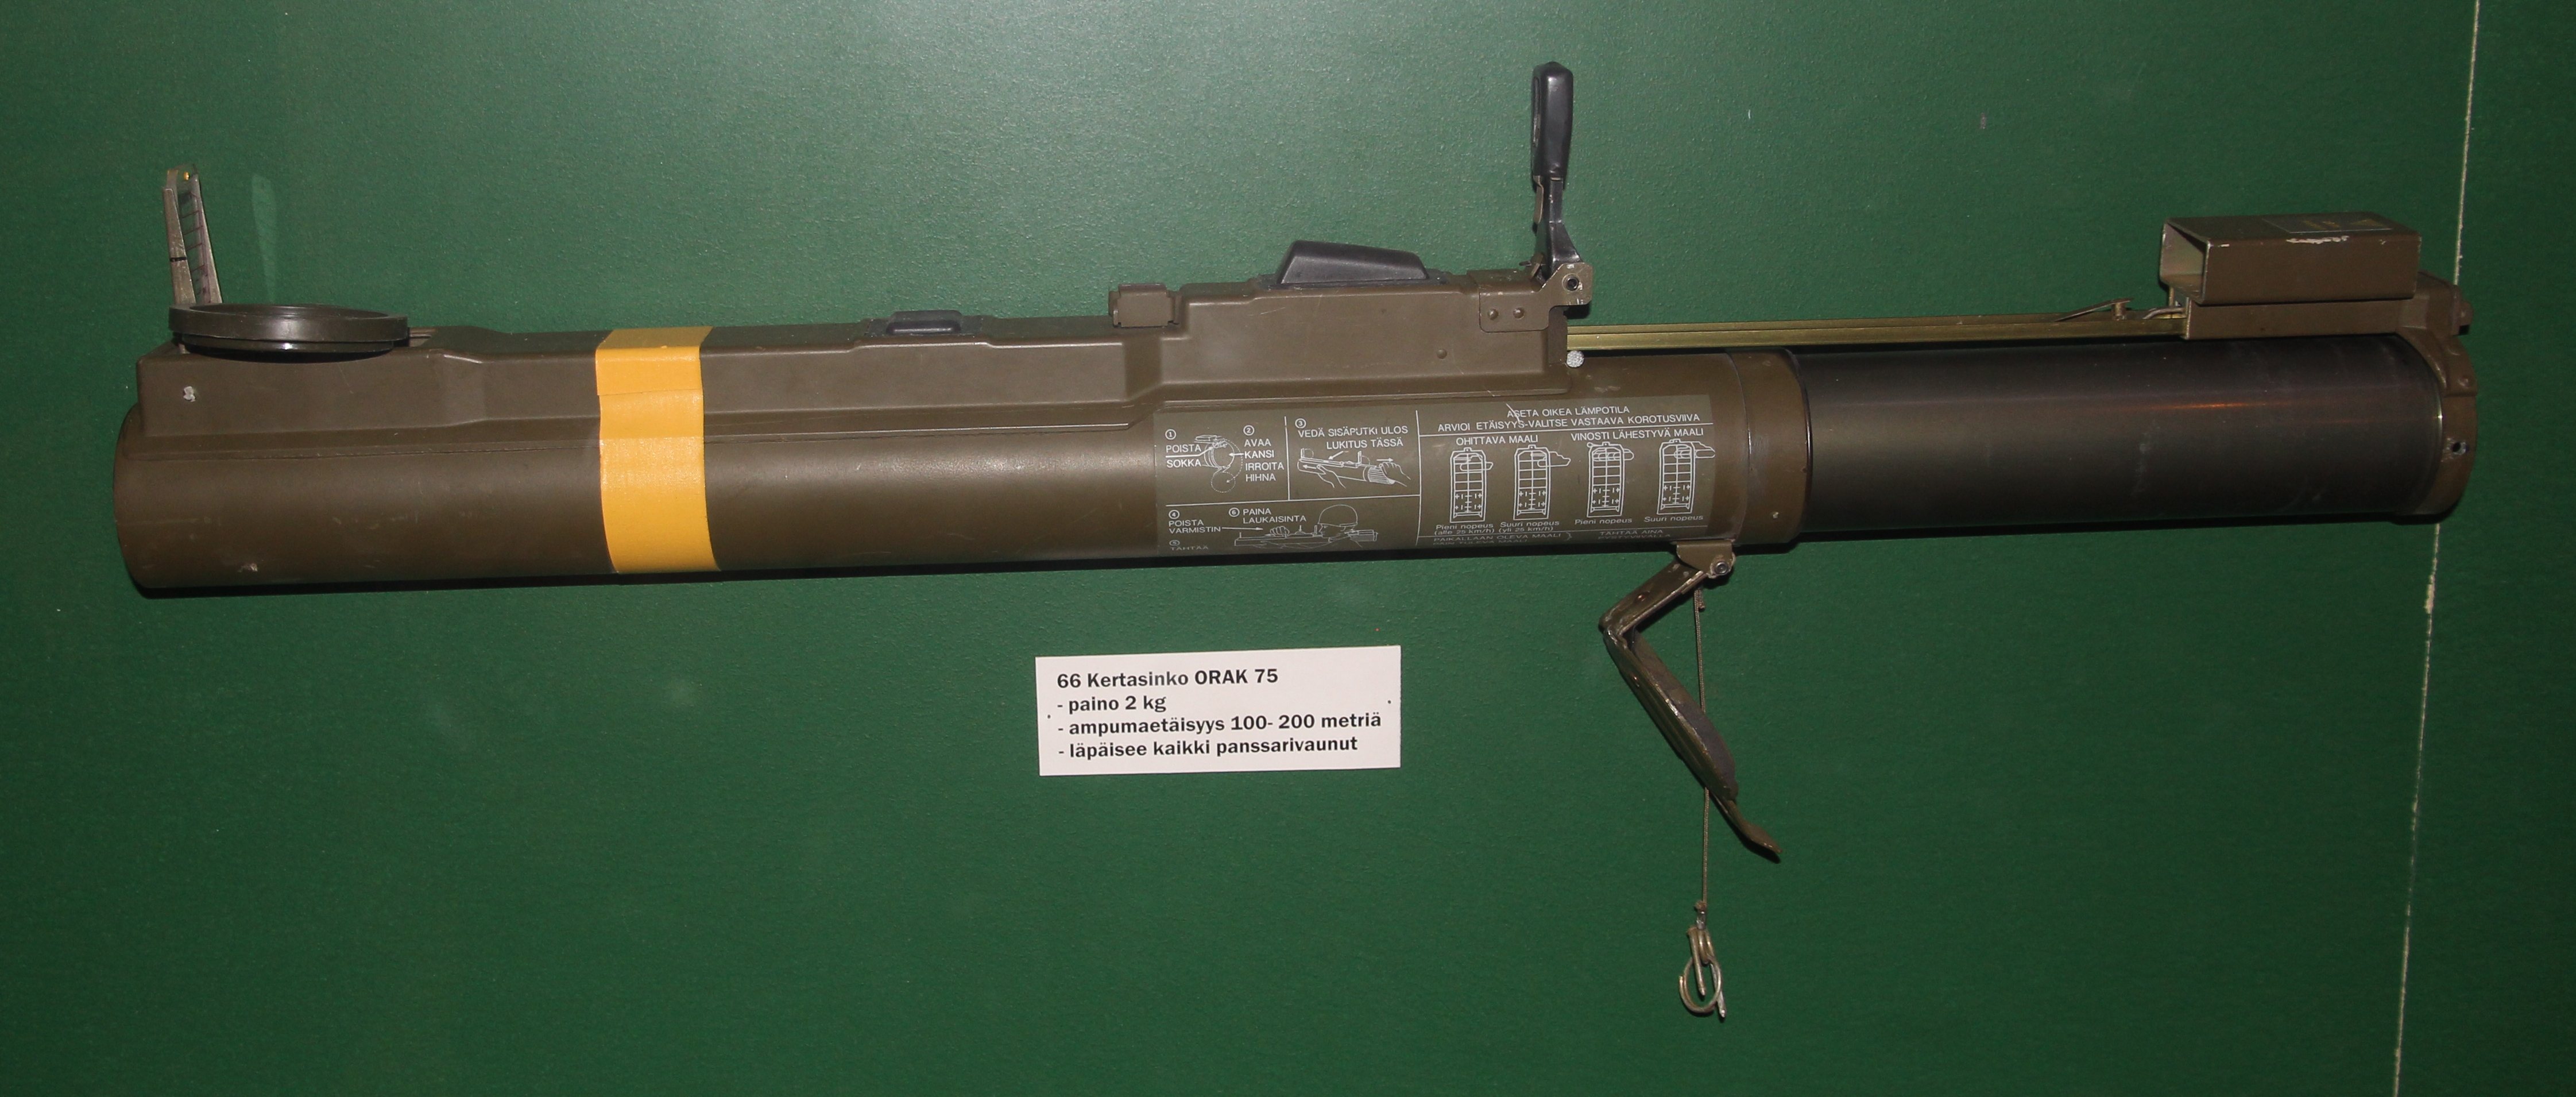 m72 law rocket launcher gun - photo #24